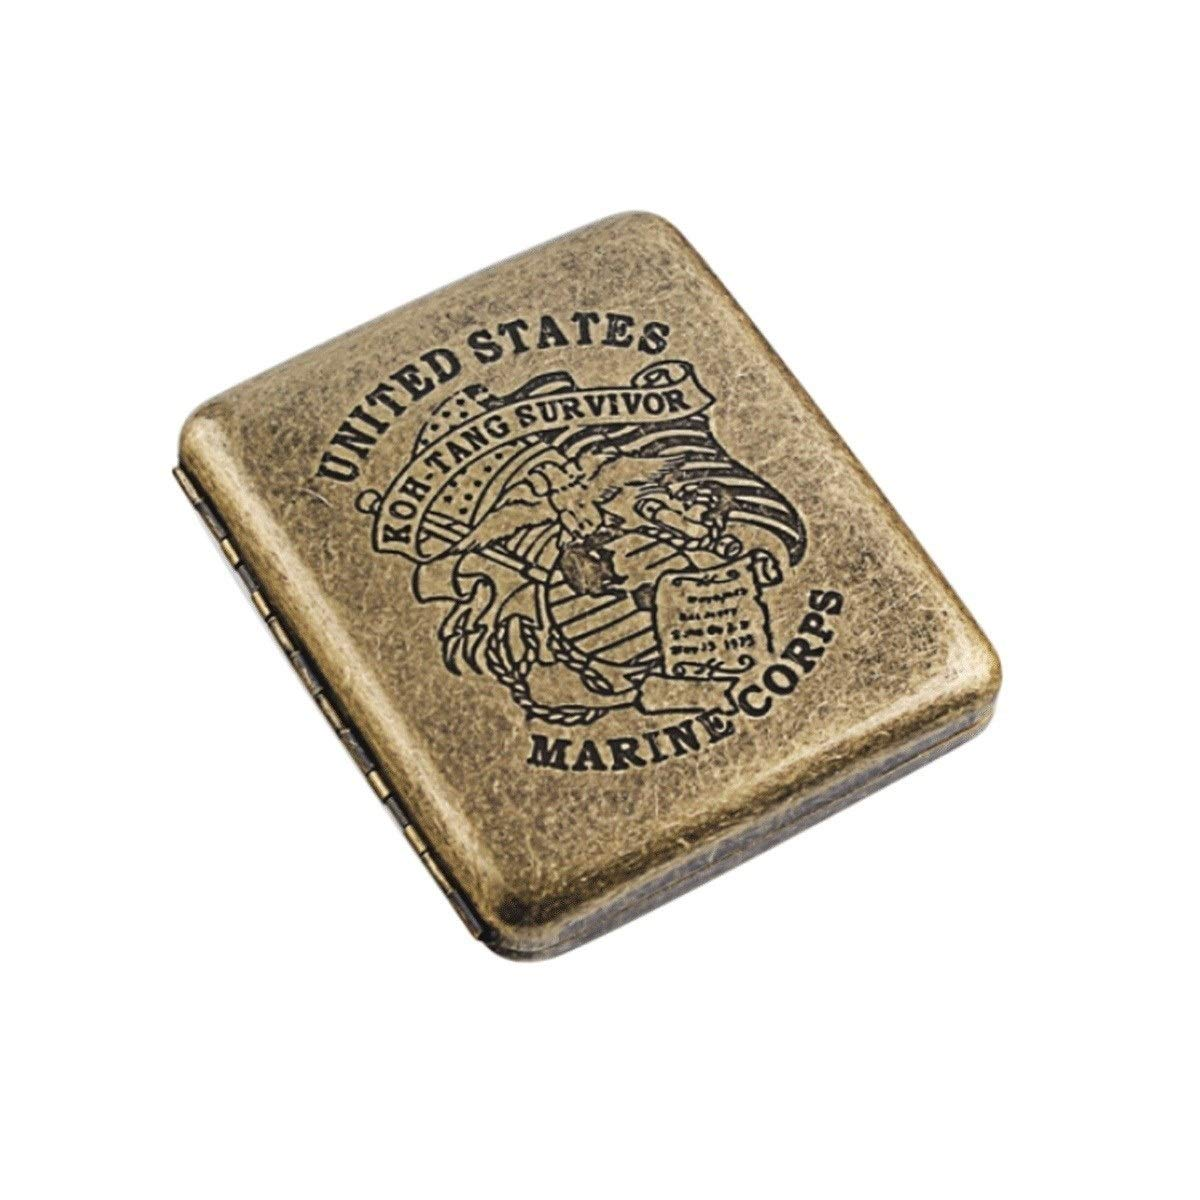 KALMAR Cigarette Case 20 Sticks Ultra-Thin Portable Flip-top Cigarette Holder Retro Stainless Steel Creative Cigarette Box, Men's Birthday Gift, Ideal Gift for Smokers, Brown, Cigarette B